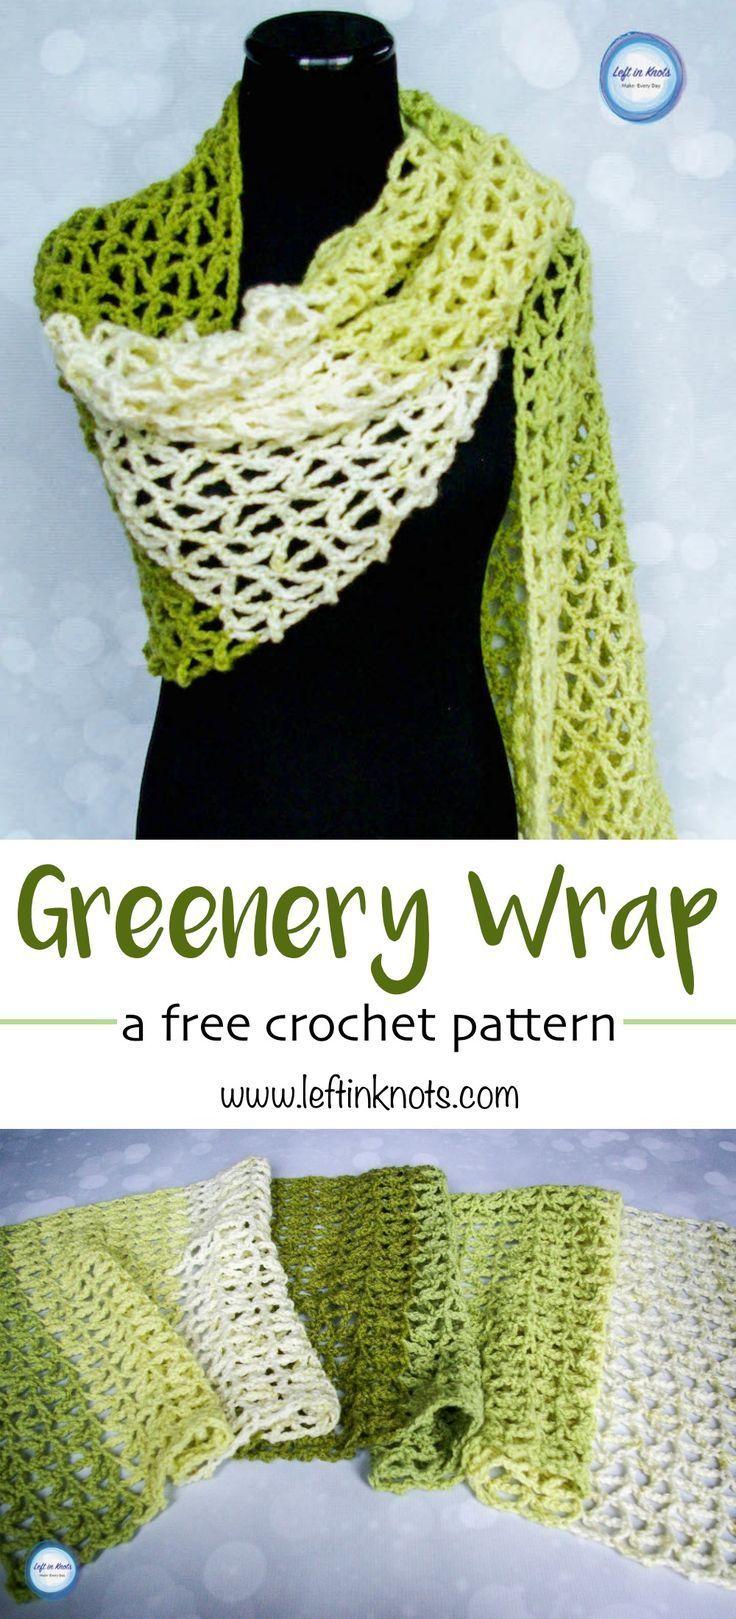 Greenery wrap modern crochet patterns modern crochet and spring greenery wrap modern crochet patternsknit bankloansurffo Image collections